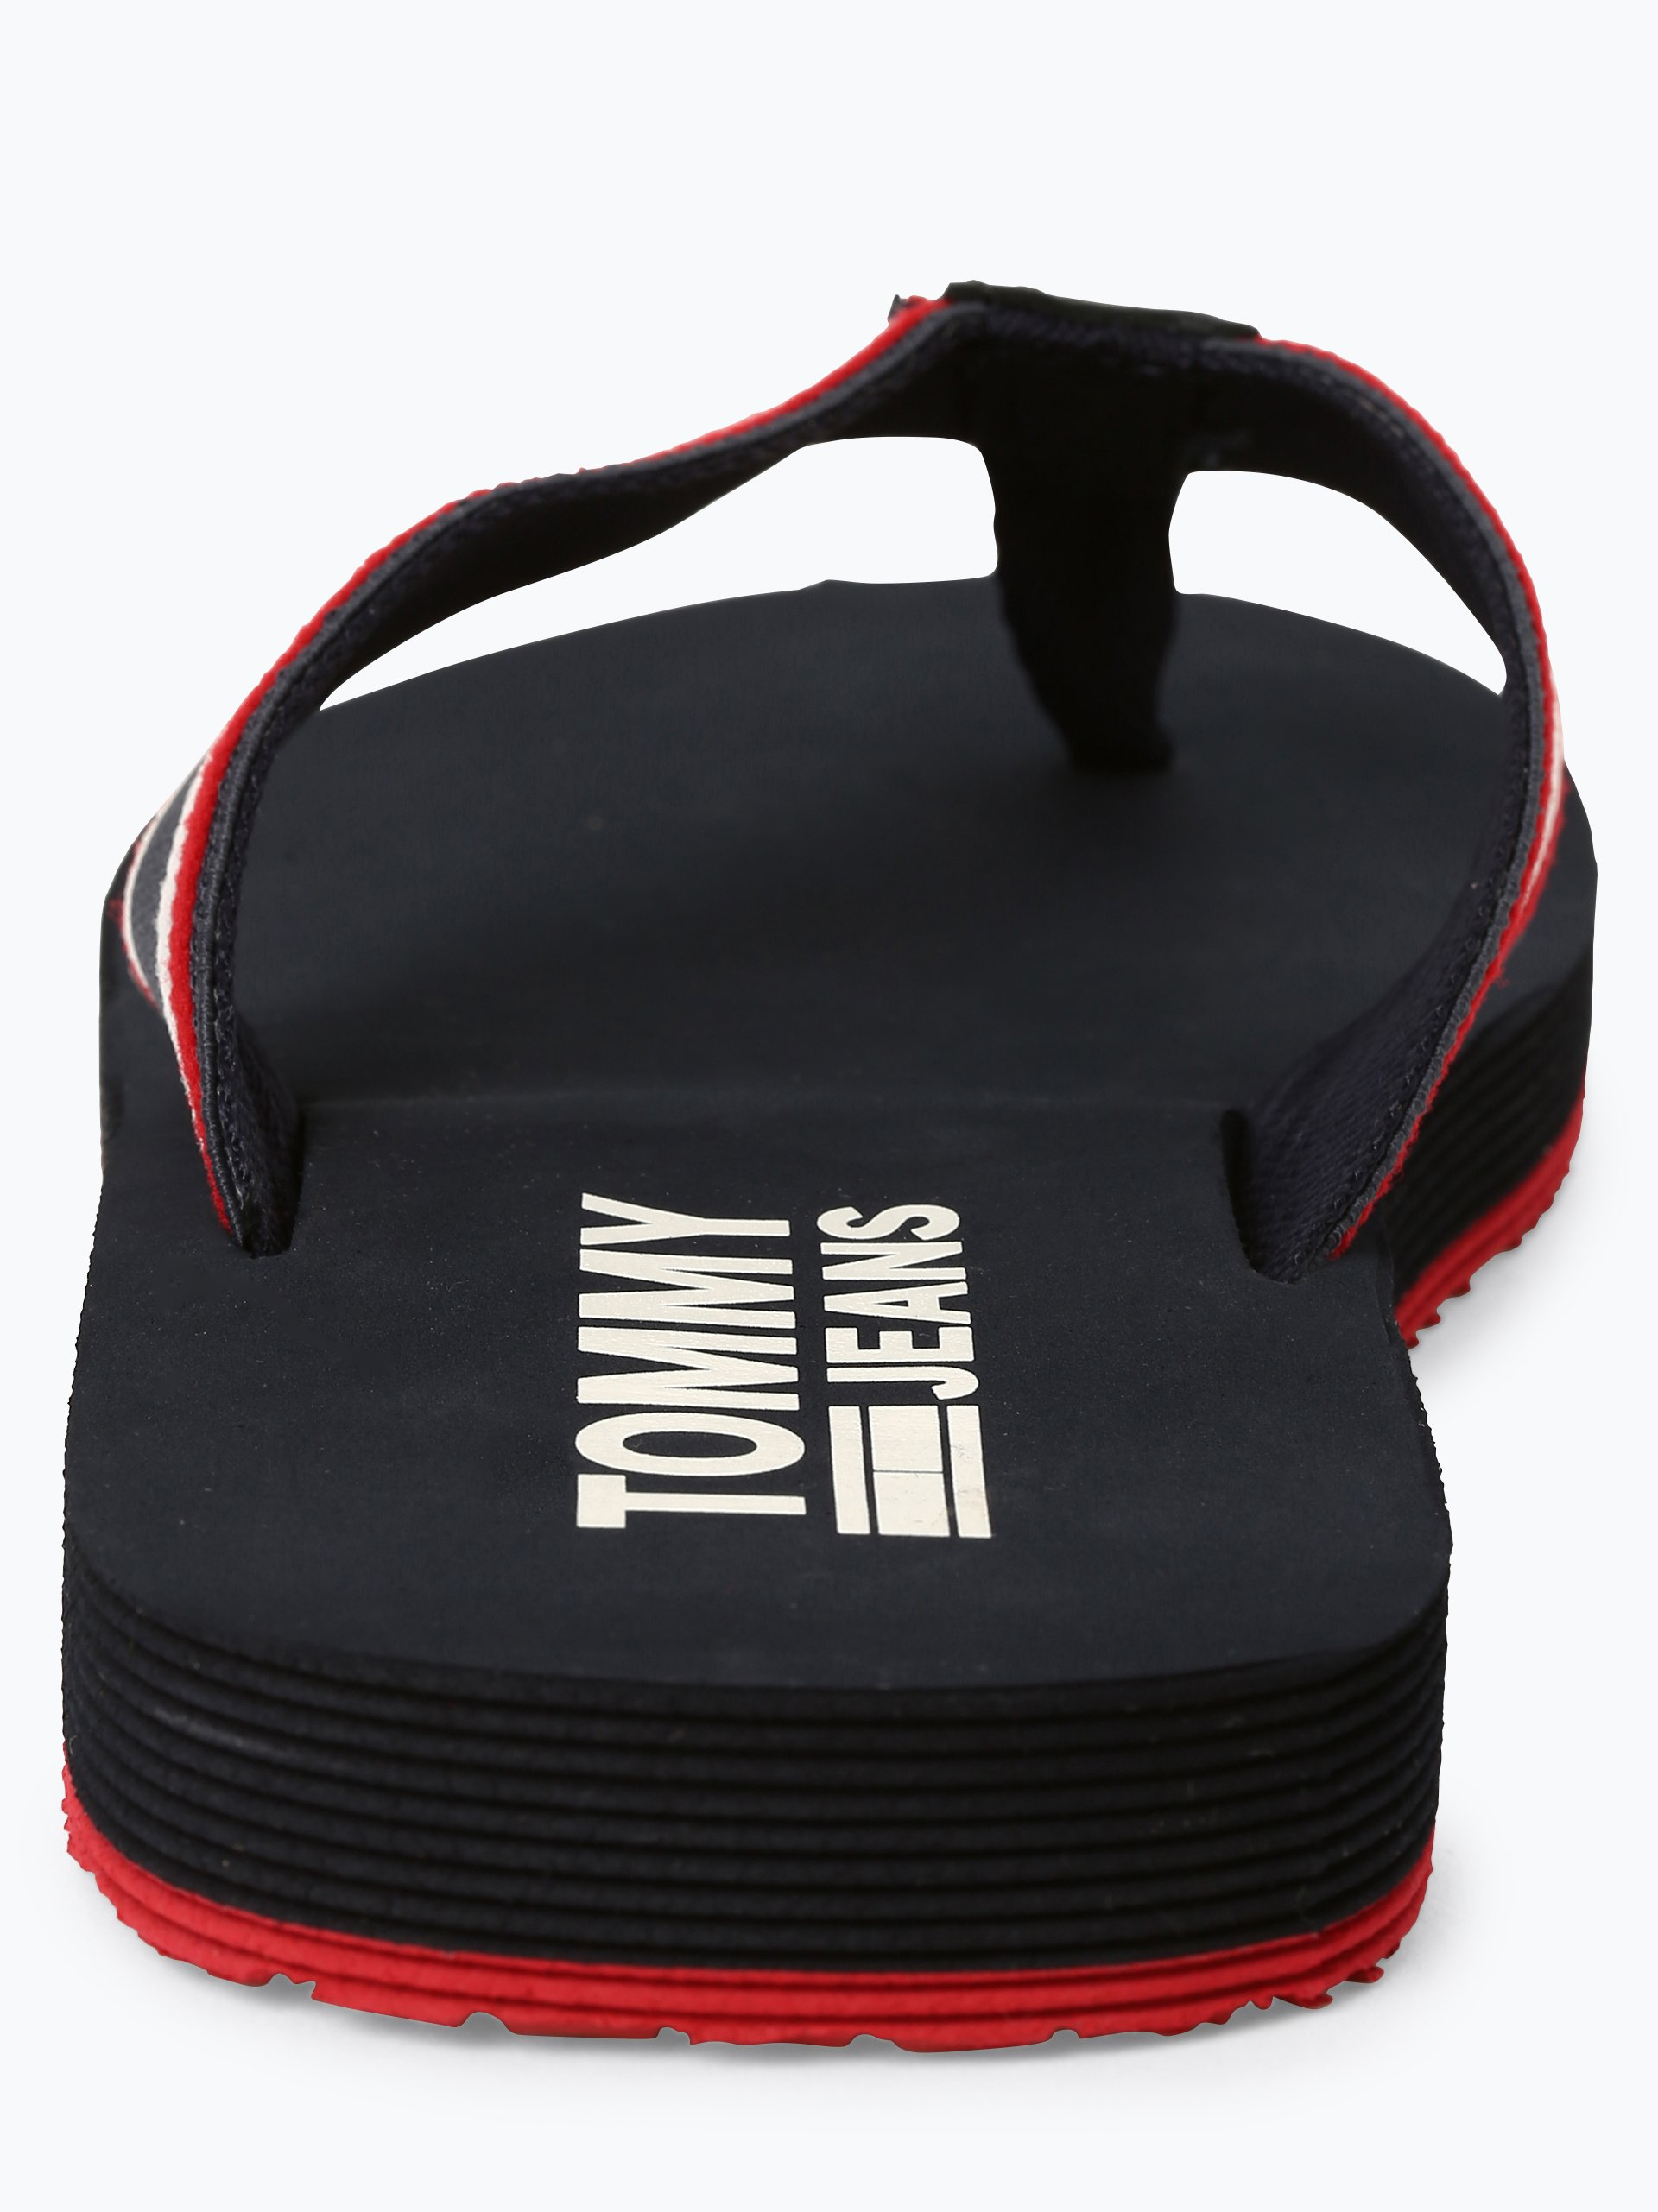 Tommy Jeans Herren Zehentrenner mit Leder-Anteil